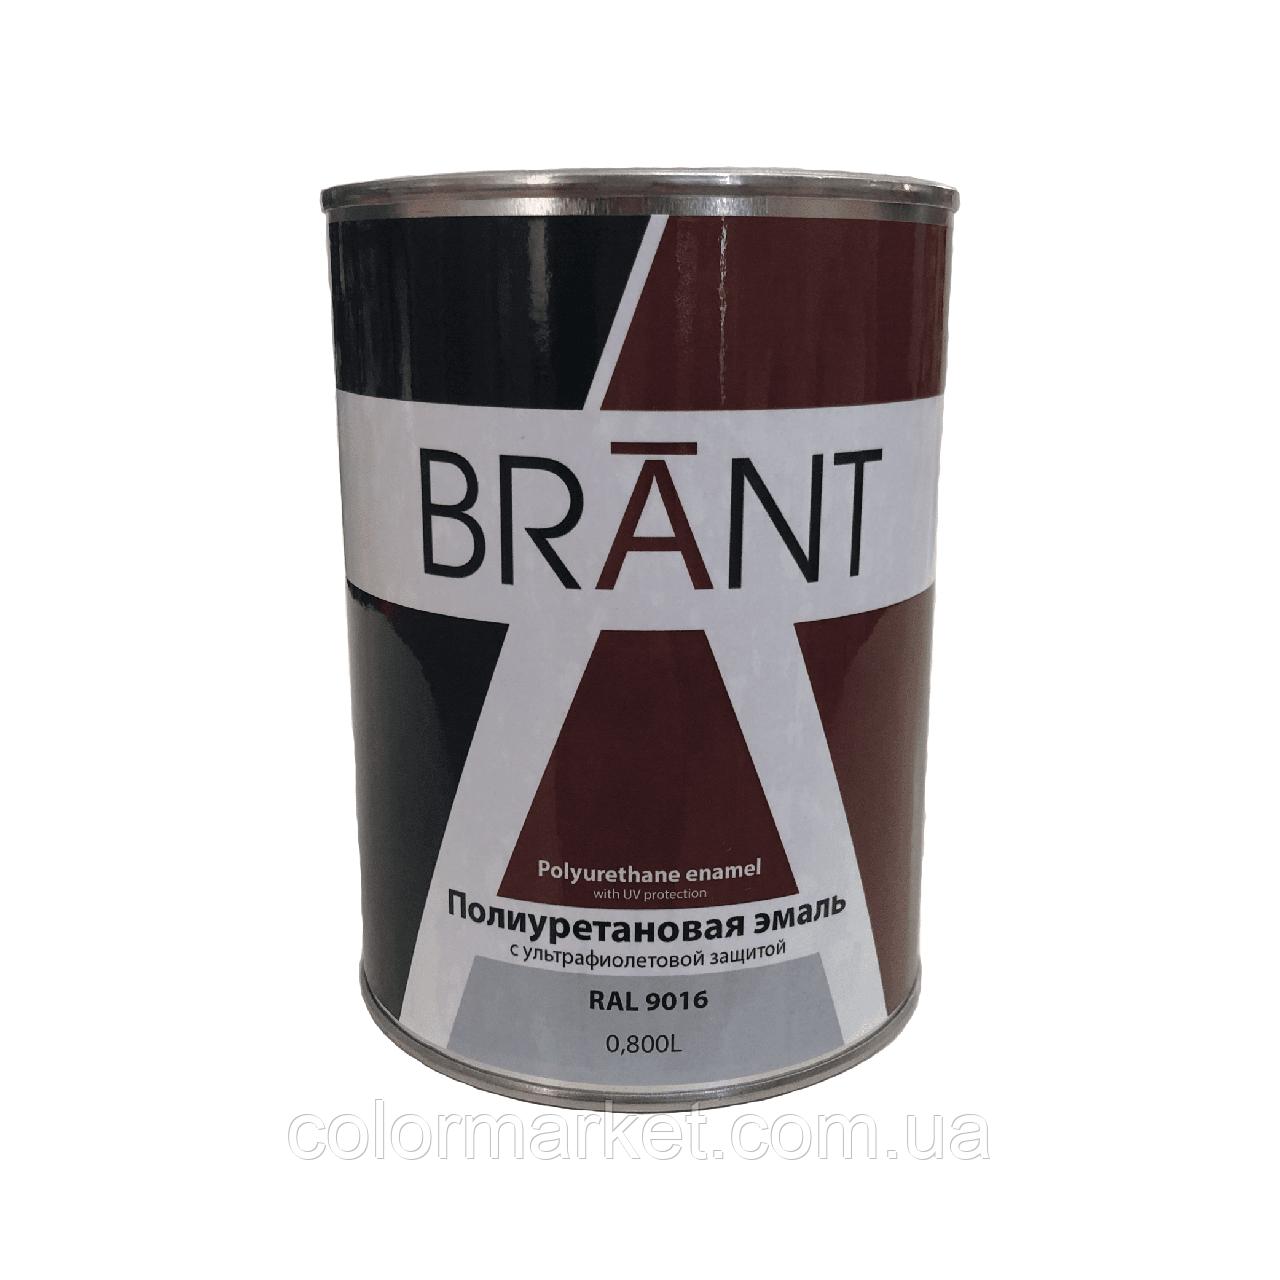 Эмаль полиуретановая цвет RAL 9016 (на ТР), 0,8 л, BRANT